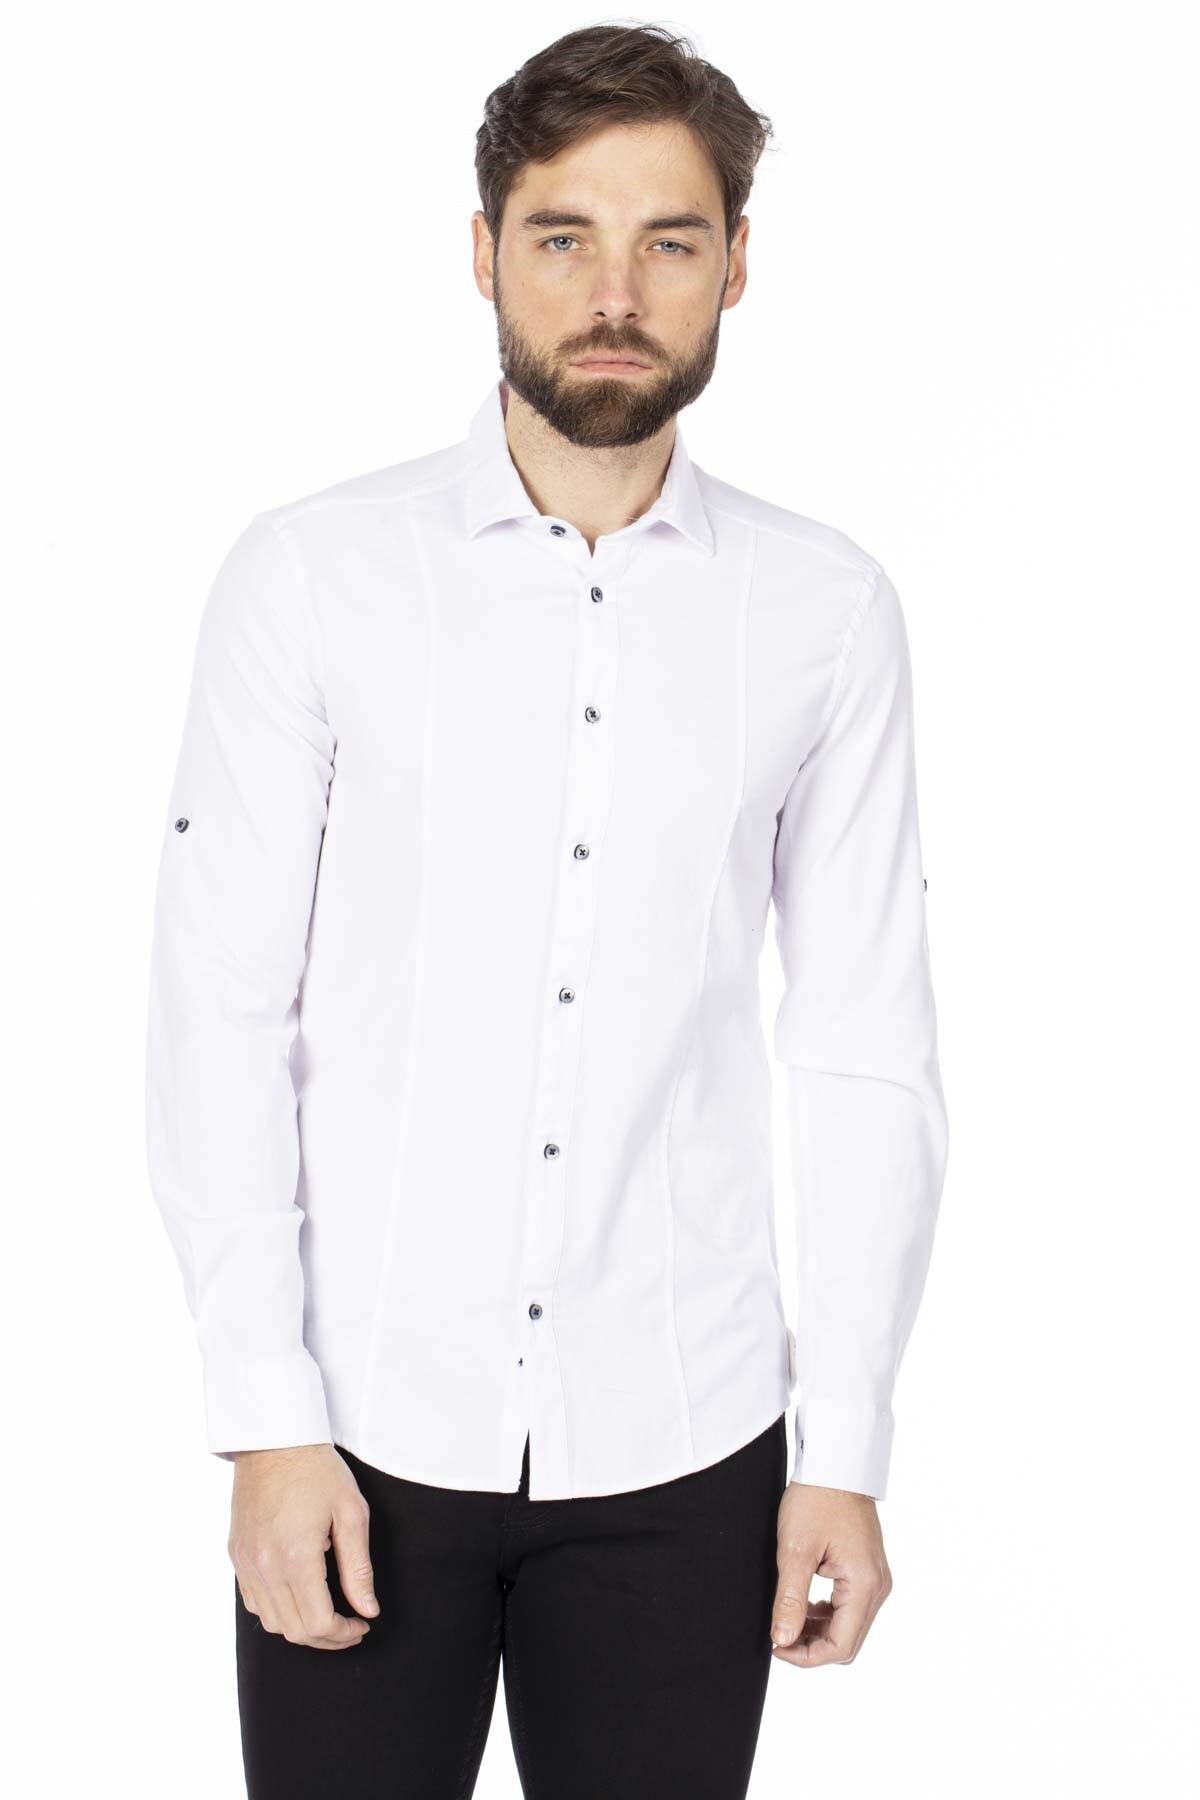 BARRELS AND OIL Erkek Beyaz Oxford Gömlek 344-20Y03003.55